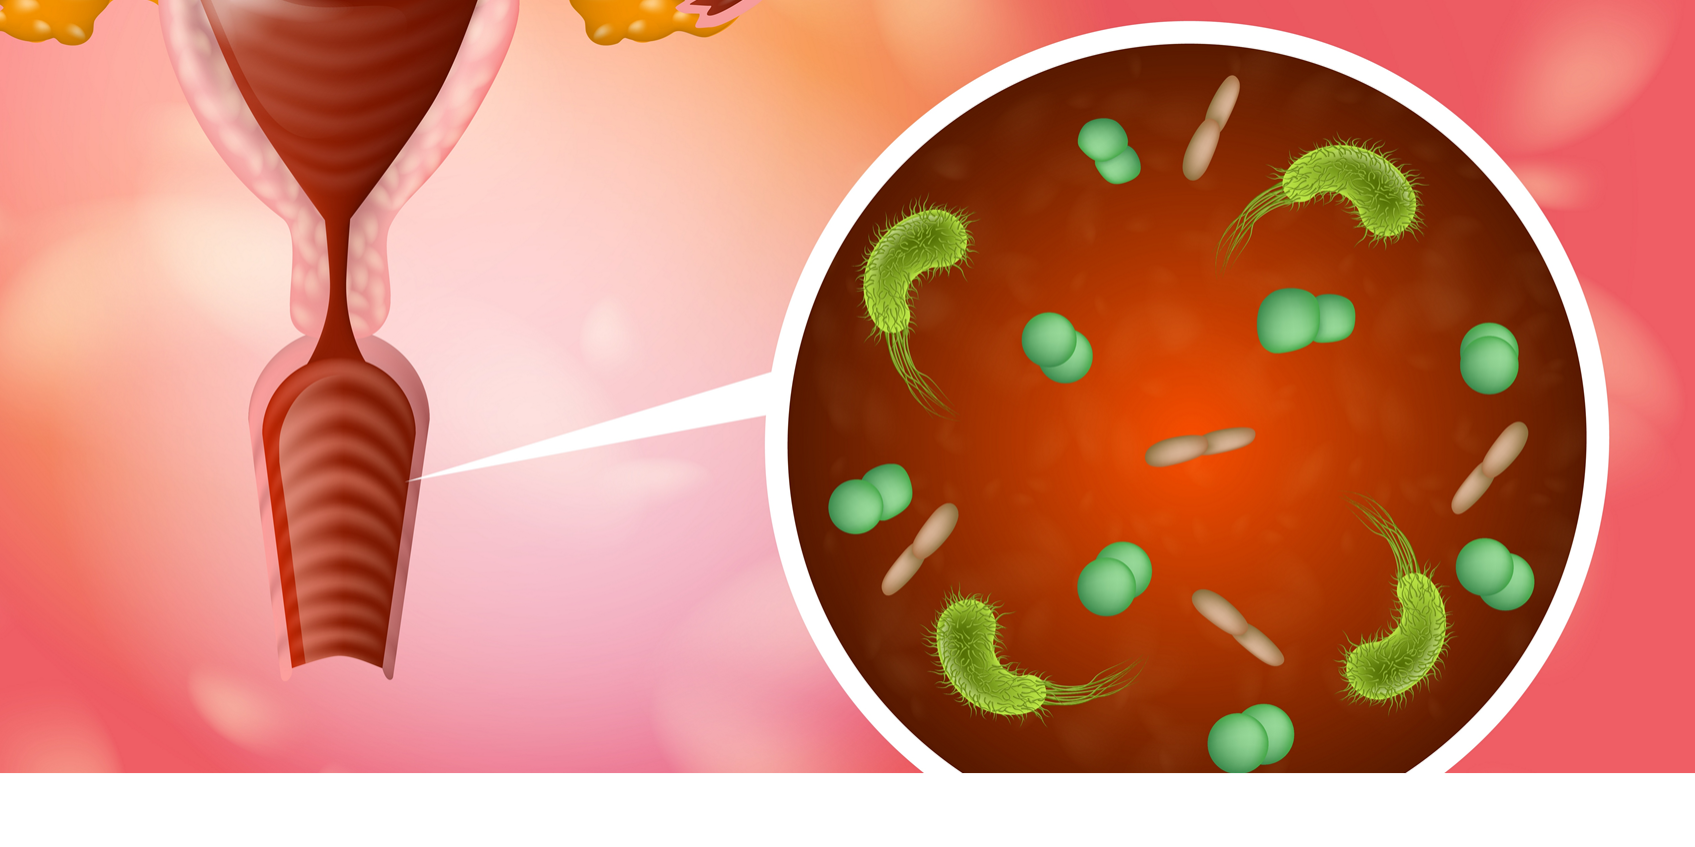 Vaginale Infecties In De Zwangerschap, Stinkende Afscheiding.fw